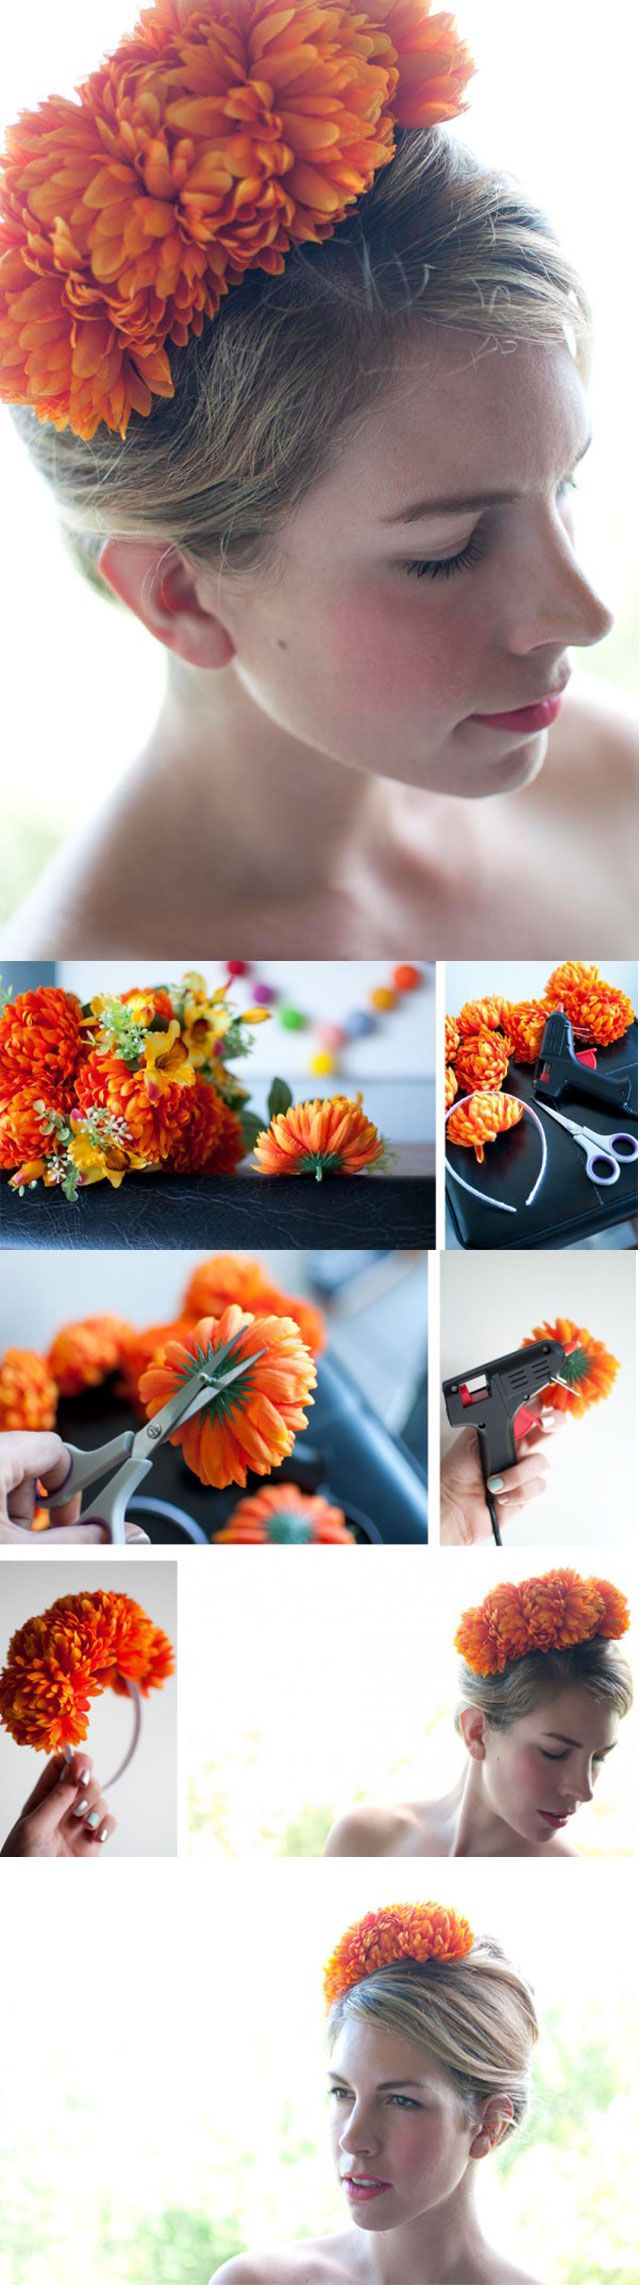 DIY Flower Hair Piece diy craft crafts craft ideas easy crafts diy ideas diy crafts easy diy diy hair diy bow craft bow craft accessories